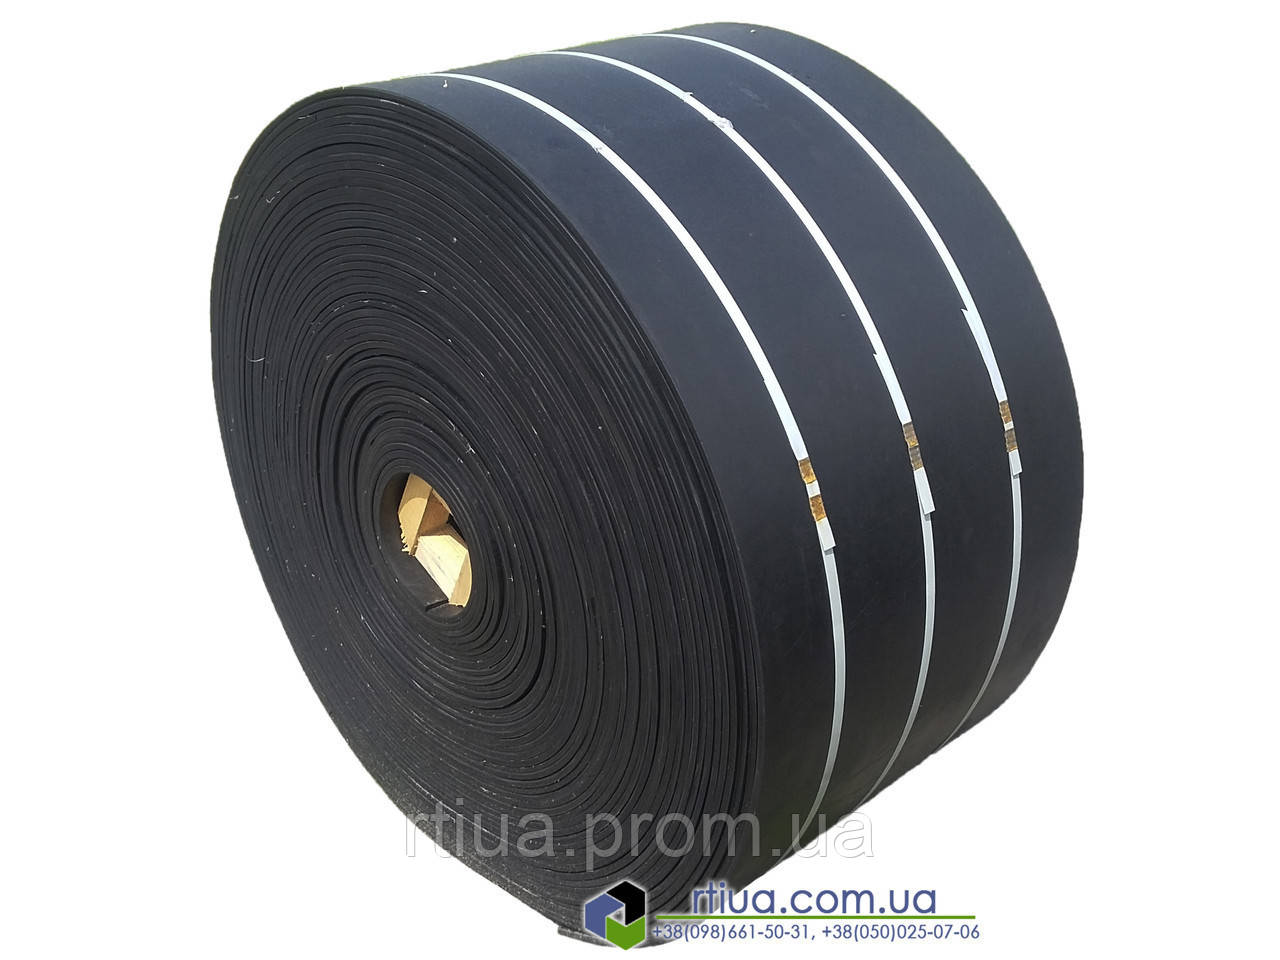 Конвейерная лента 500х10 мм